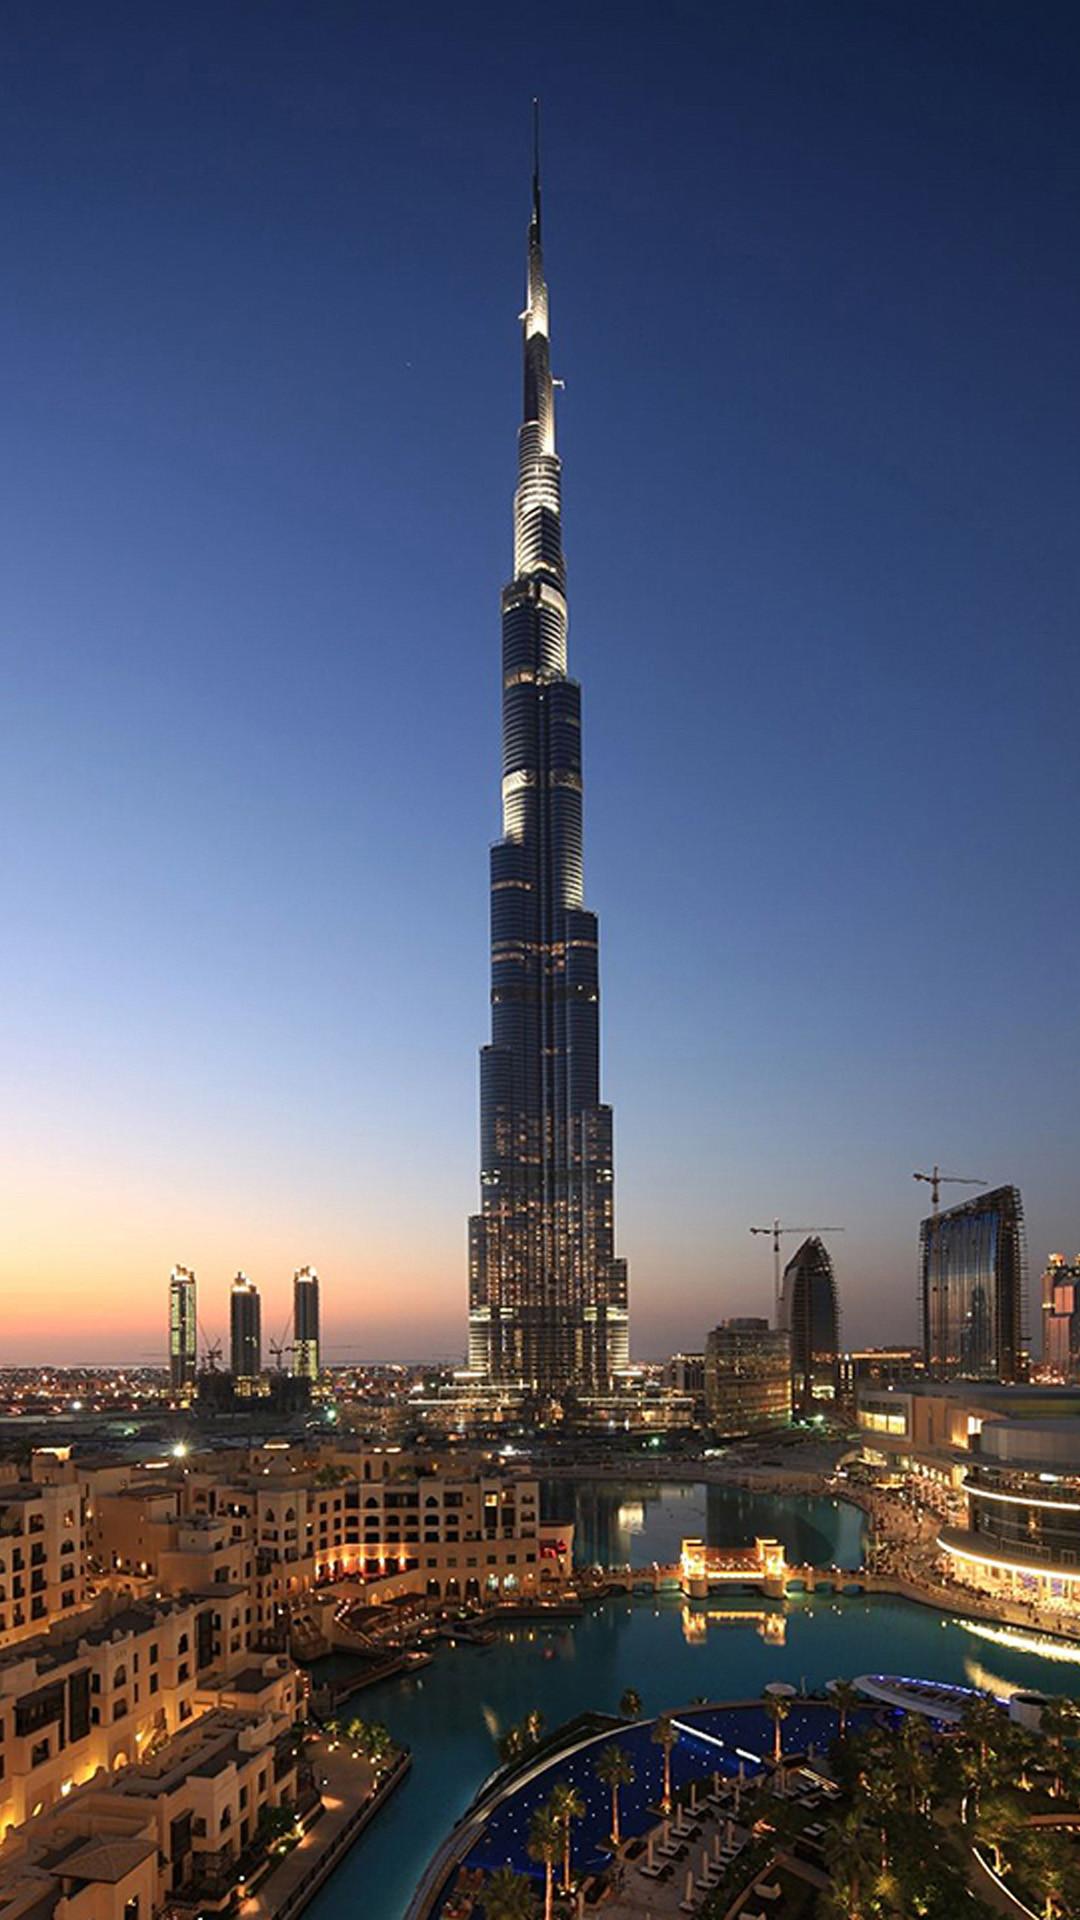 Burj khalifa wallpapers 70 pictures - Dubai burj khalifa hd photos ...